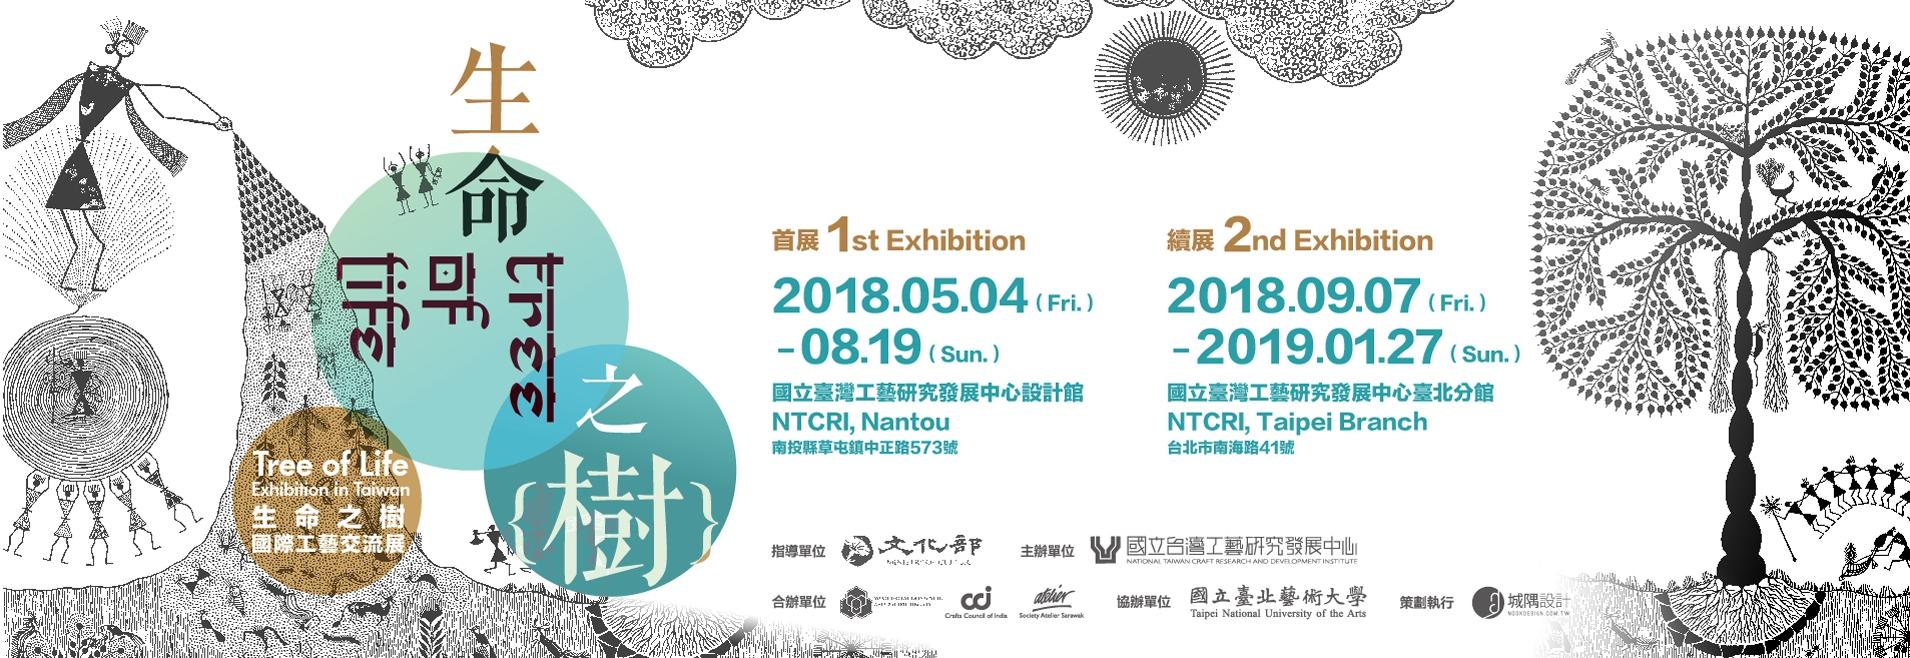 Tree of Life Exhibition in Taiwan-生命之樹國際工藝交流展[另開新視窗]